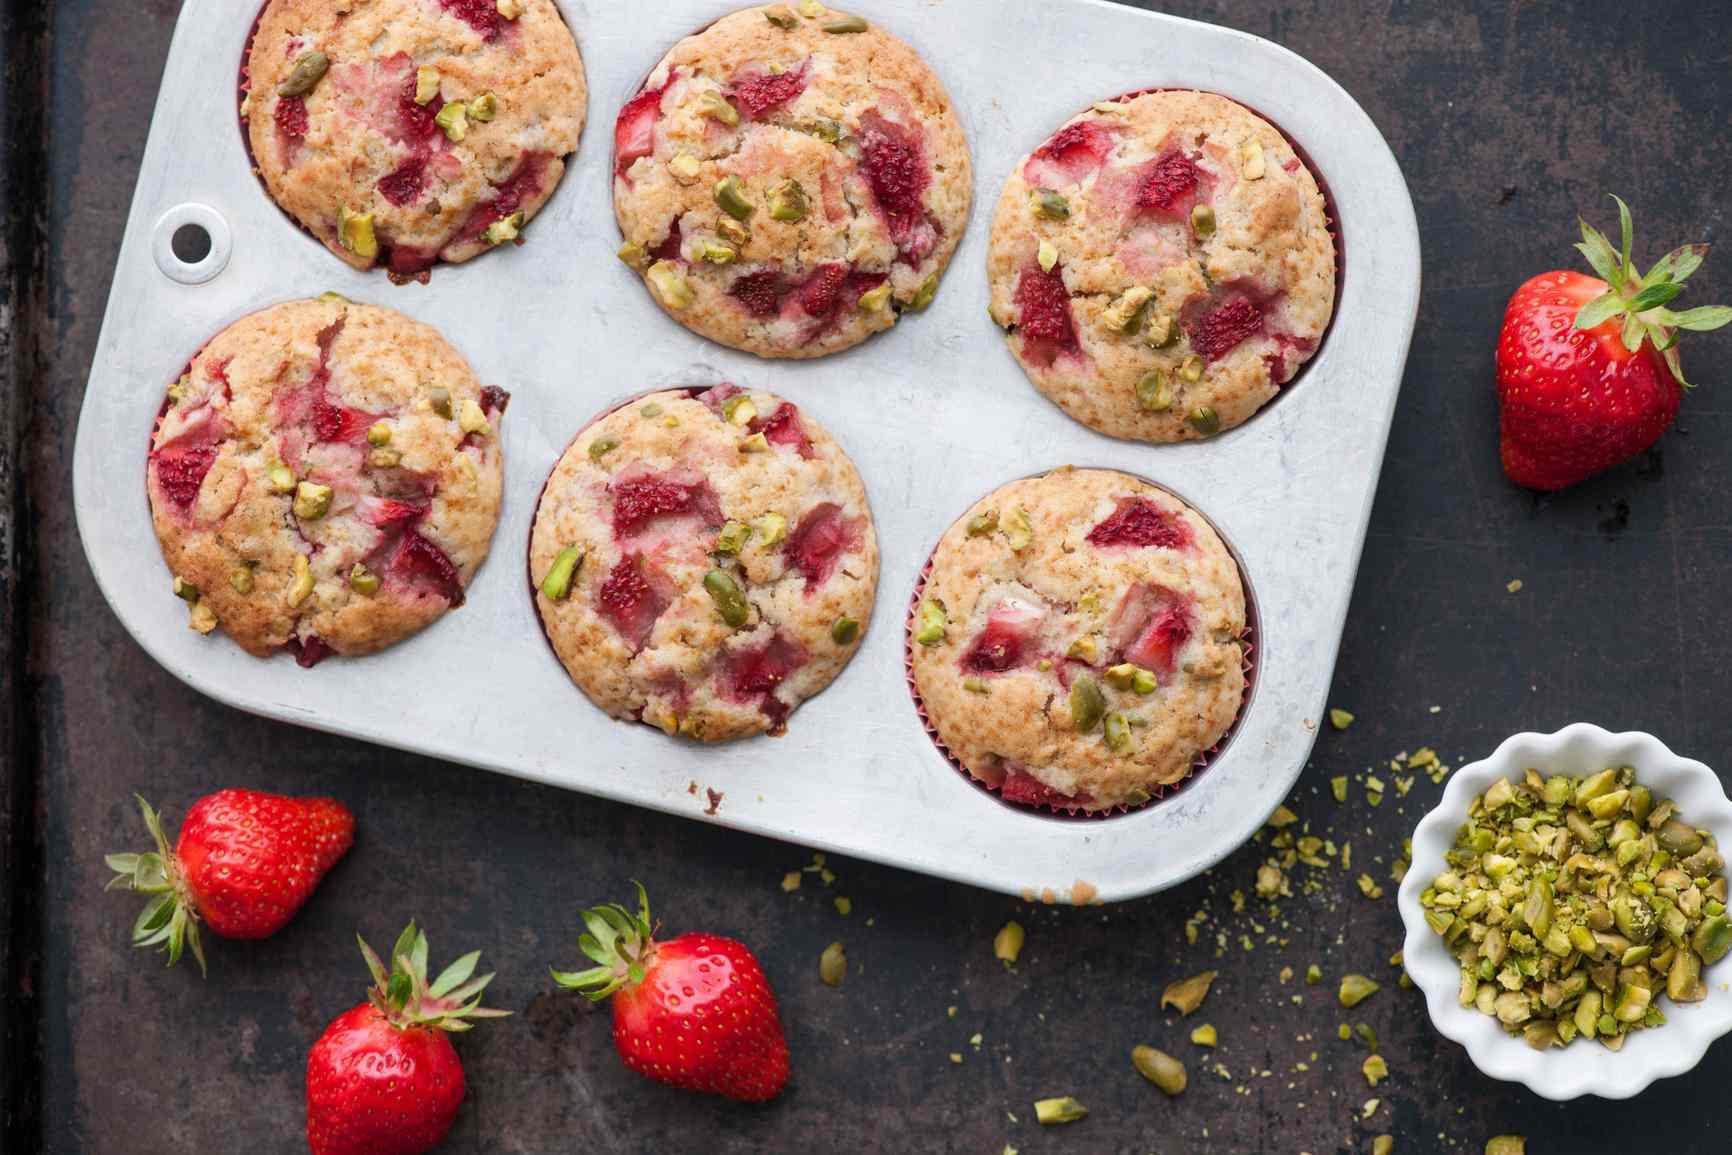 strawberry pistachio breakfast muffins